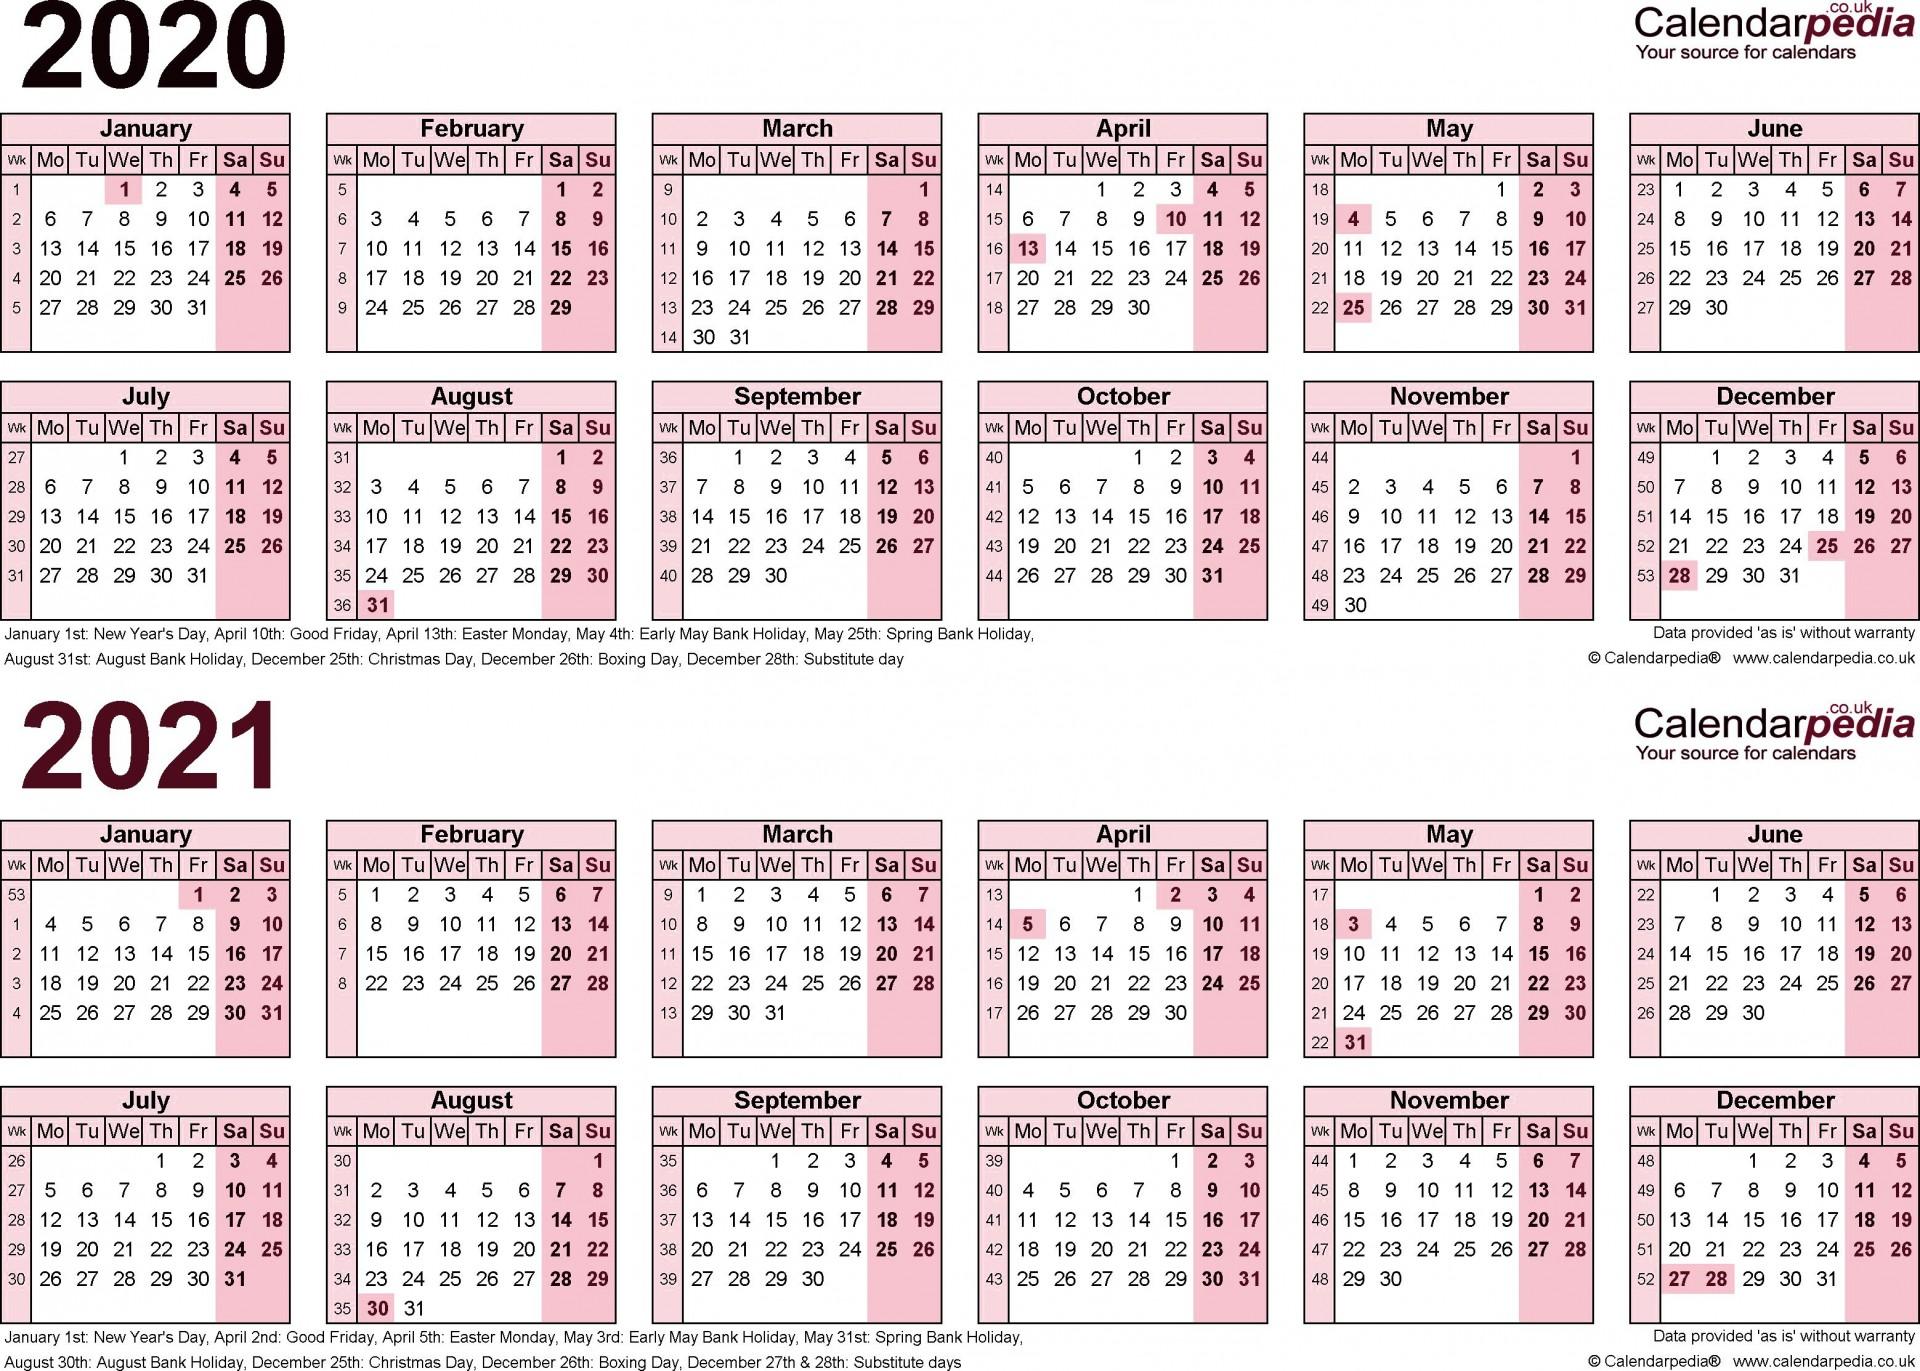 008 Fantastic Payroll Calendar Template 2020 Example  Biweekly Schedule Excel Free1920